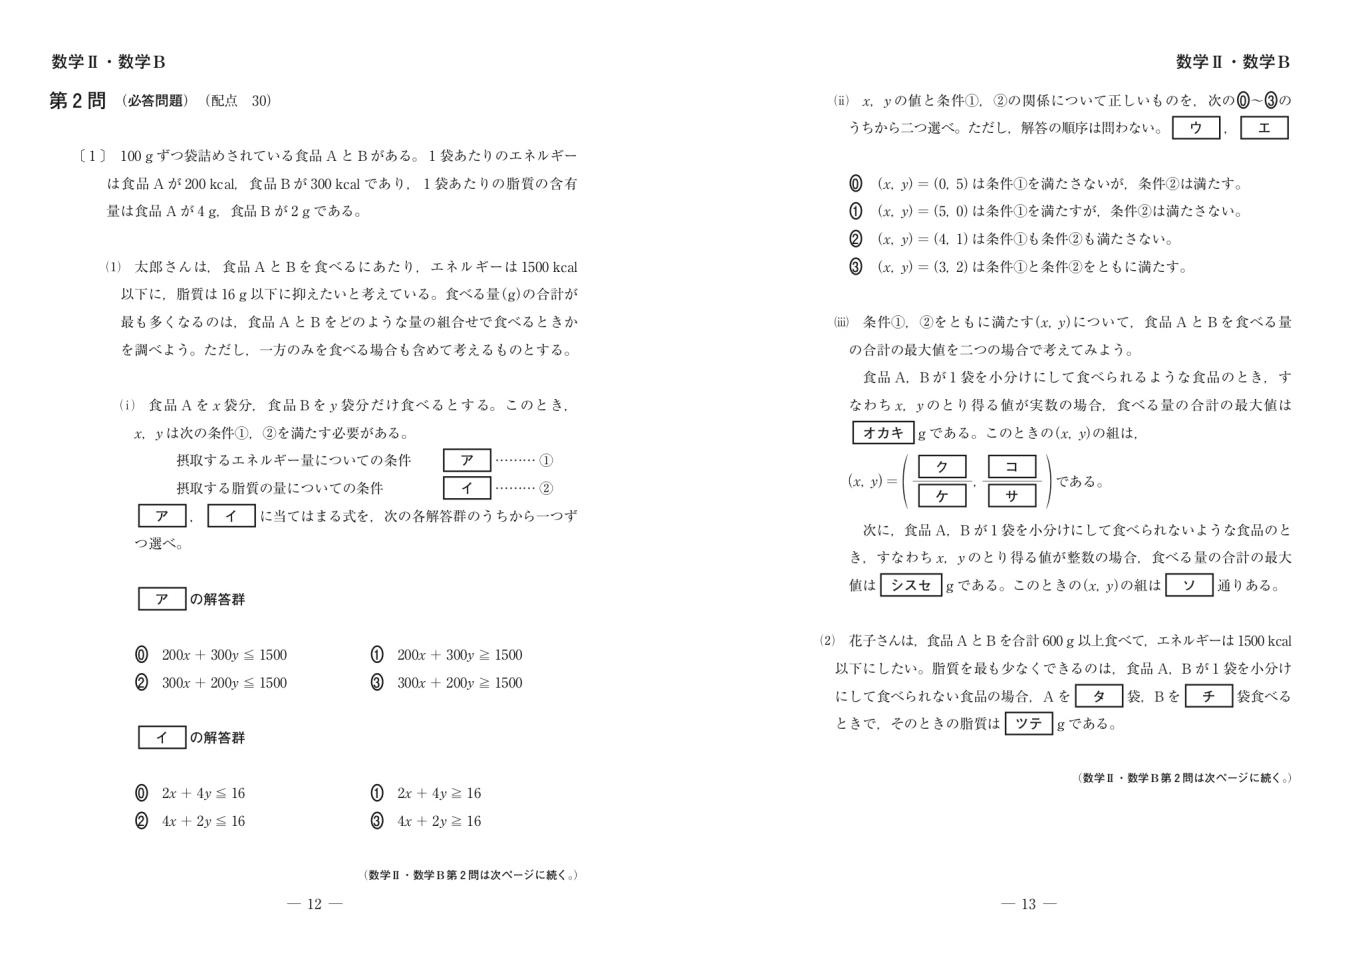 ※数学:「大学入学共通テスト」試行調査(平成30年度実施分)より一部抜粋